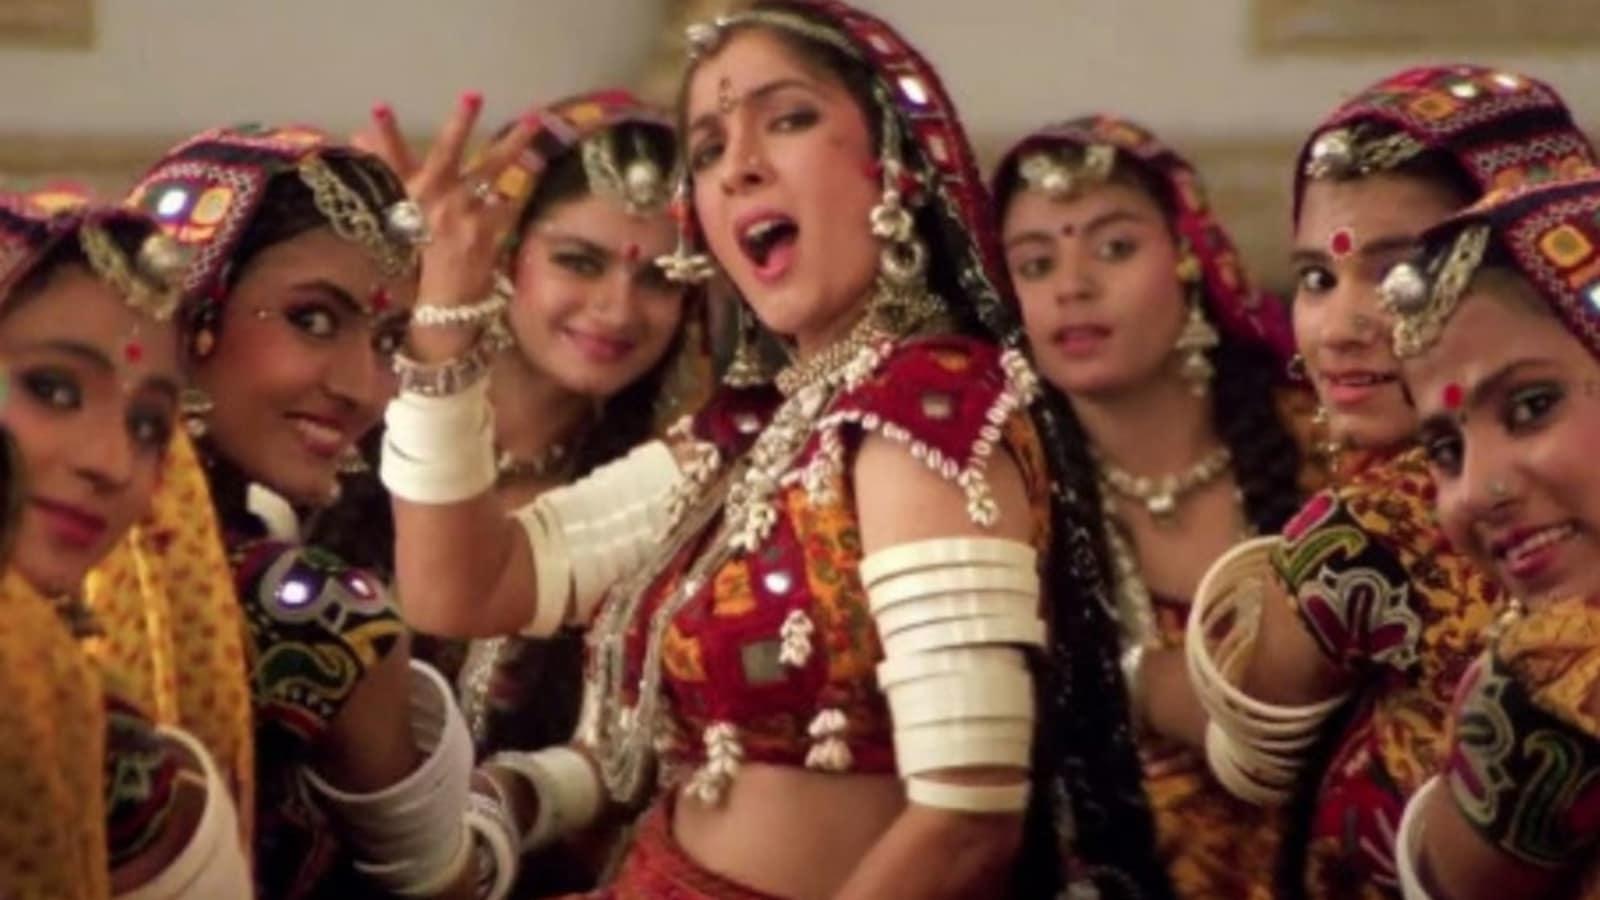 Neena Gupta recalls feeling embarrassed after Subhash Ghai demanded she wear 'padded bra' for Choli Ke Peeche | Bollywood - Hindustan Times